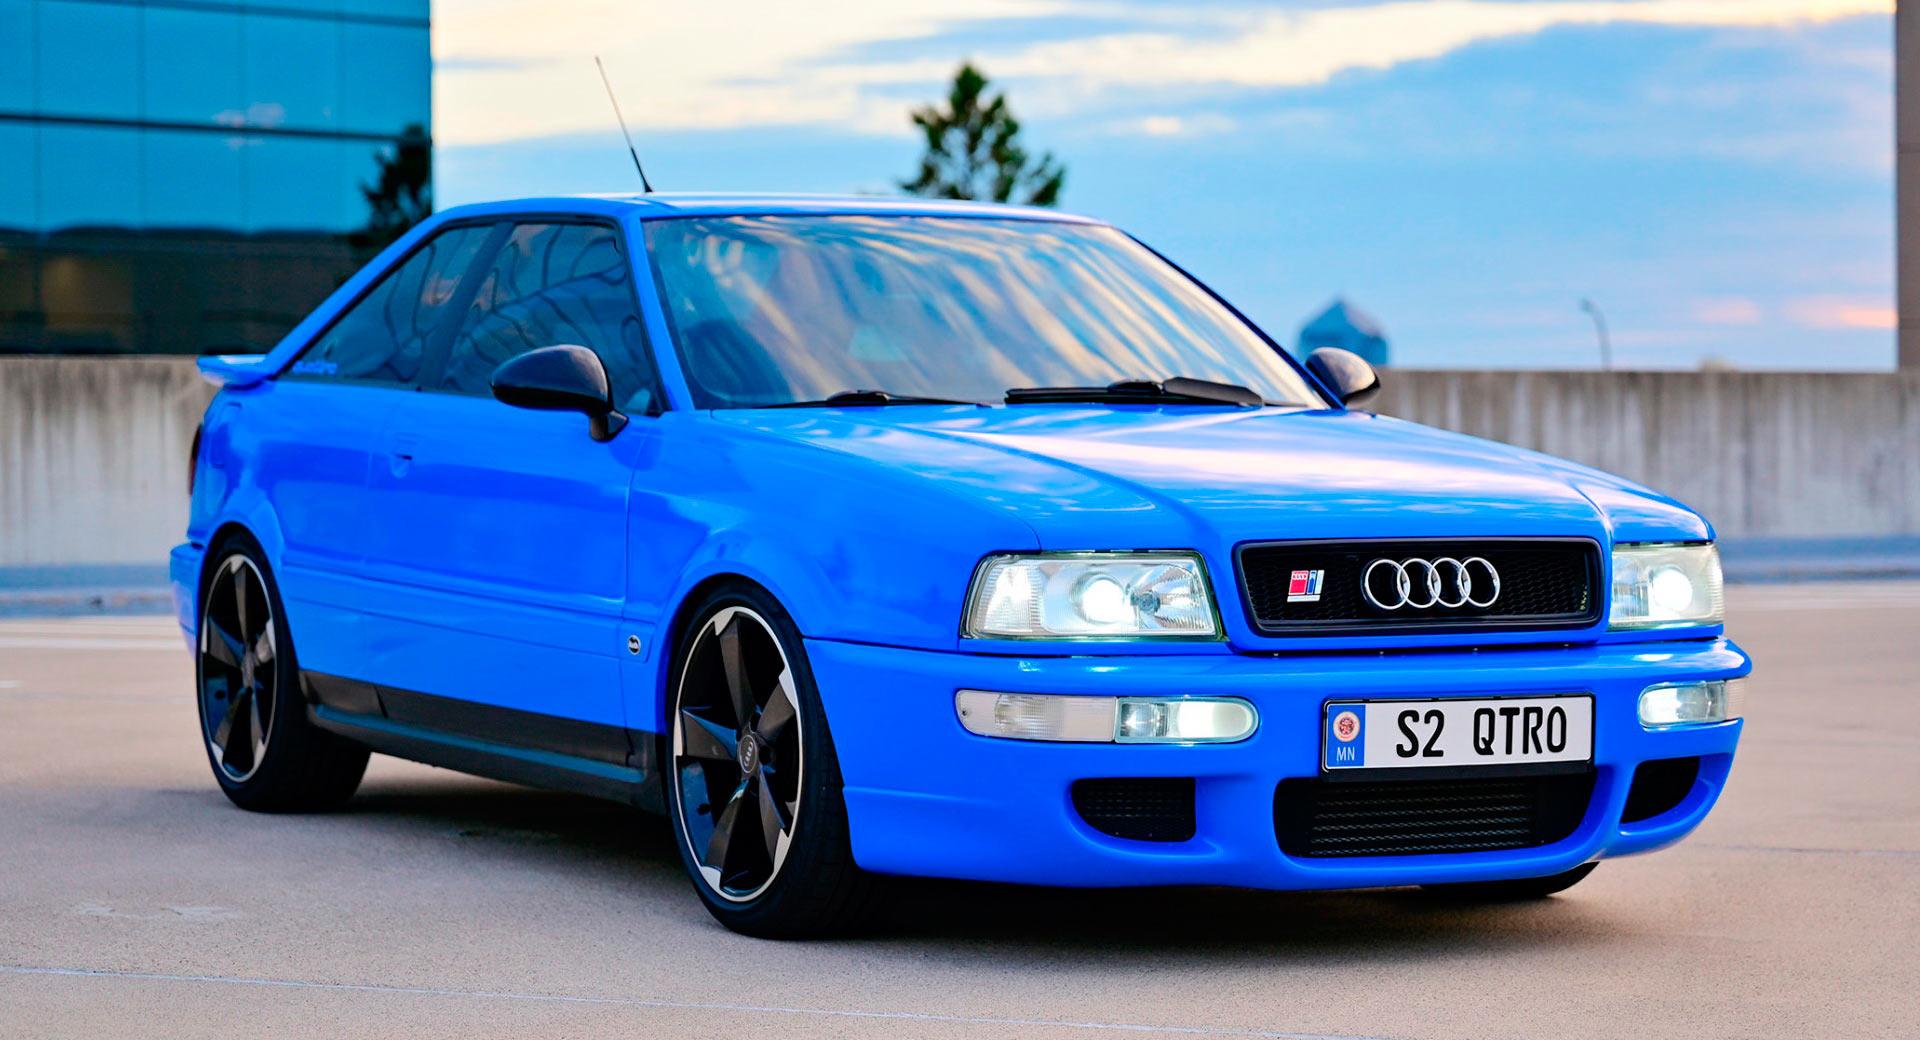 Kelebihan Audi 1990 Murah Berkualitas